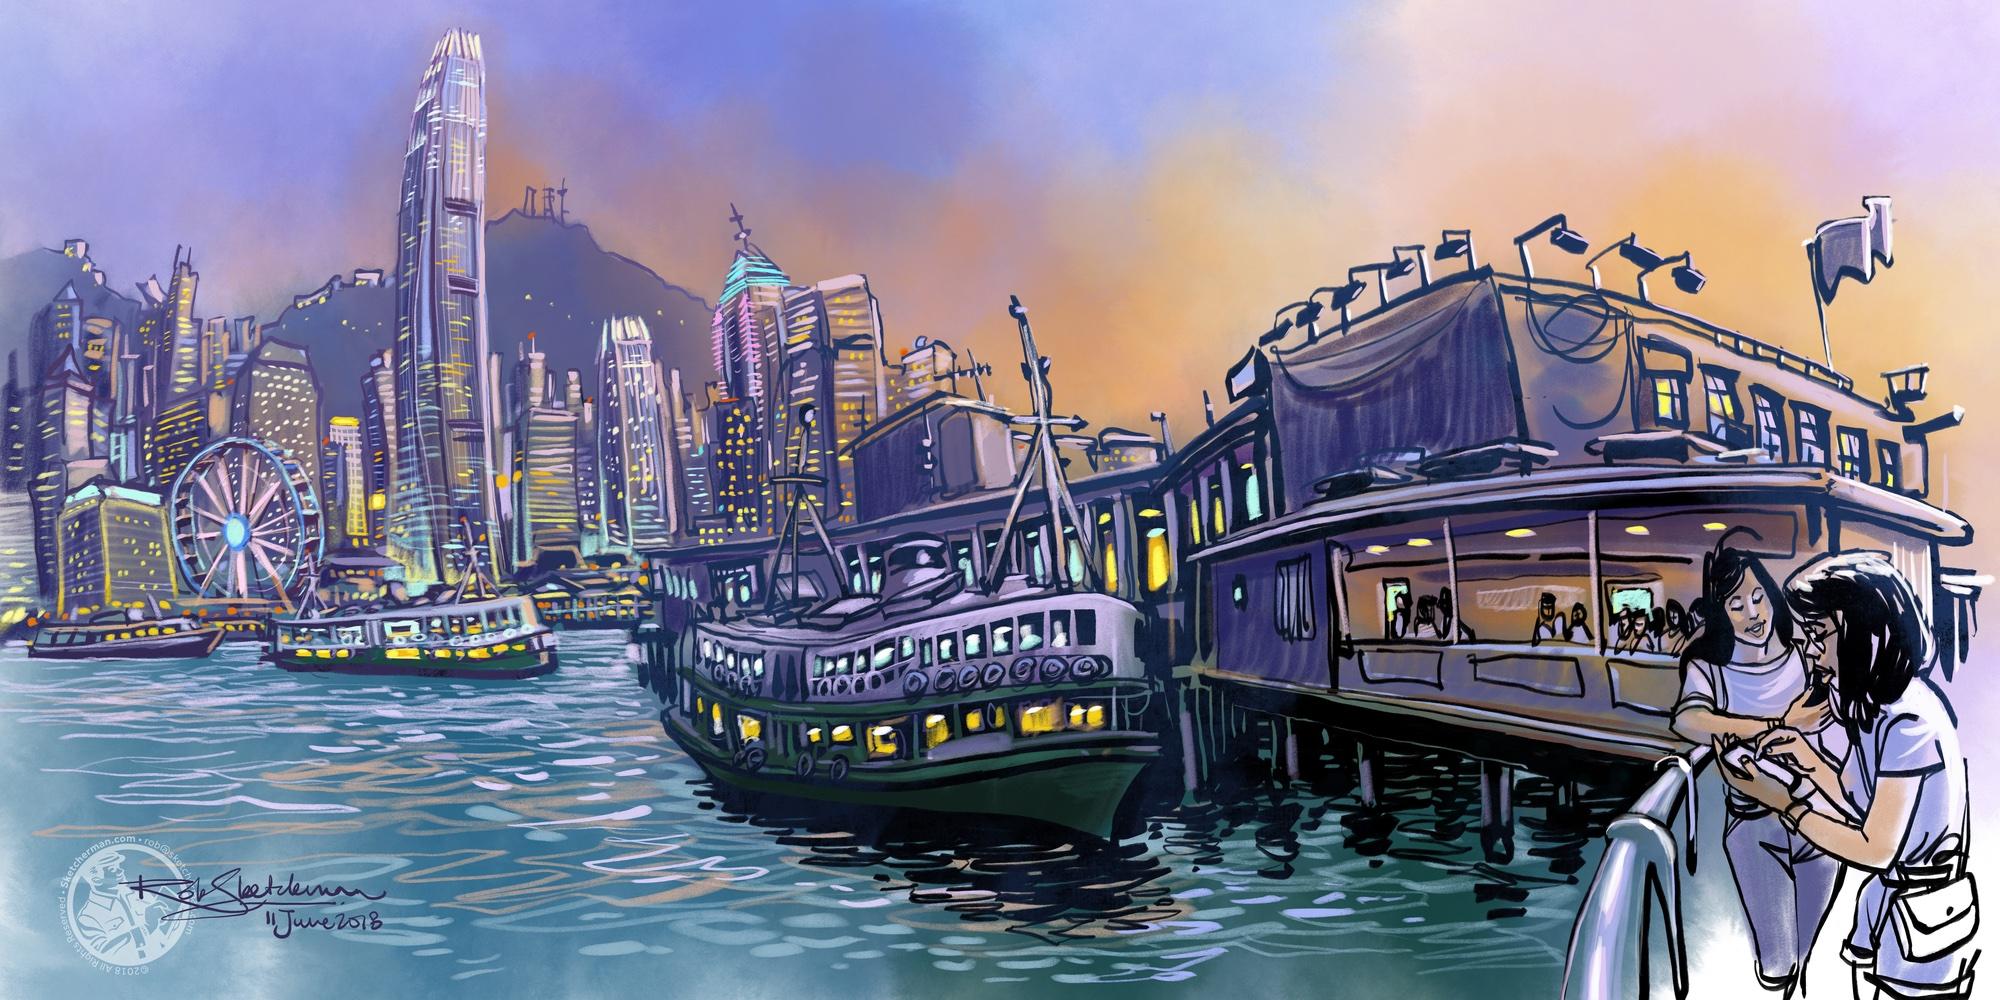 Star_Ferry-City_Lights-Sketcherman.jpg